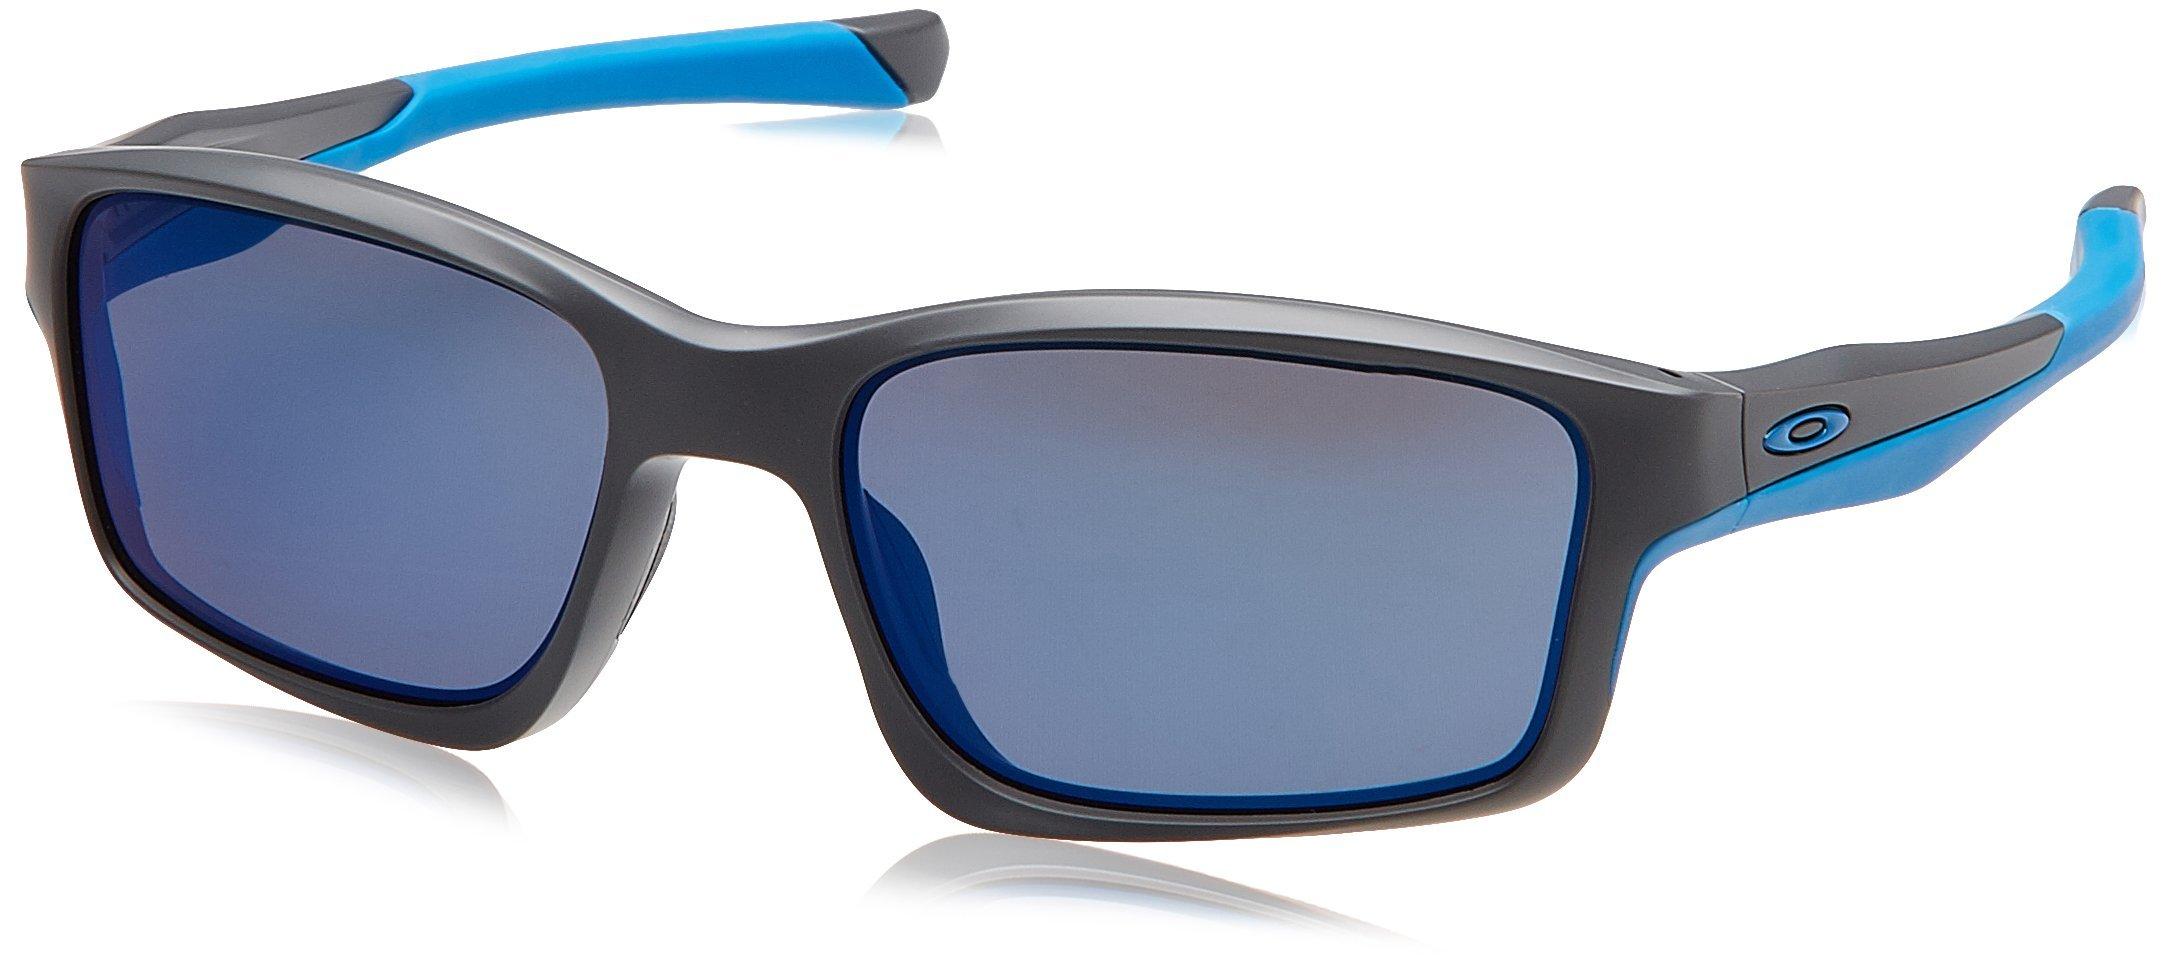 Oakley Mens Chailink OO9247-05 Non-Polarized Ractangular Eyeglasses, Matte Grey, 57 mm